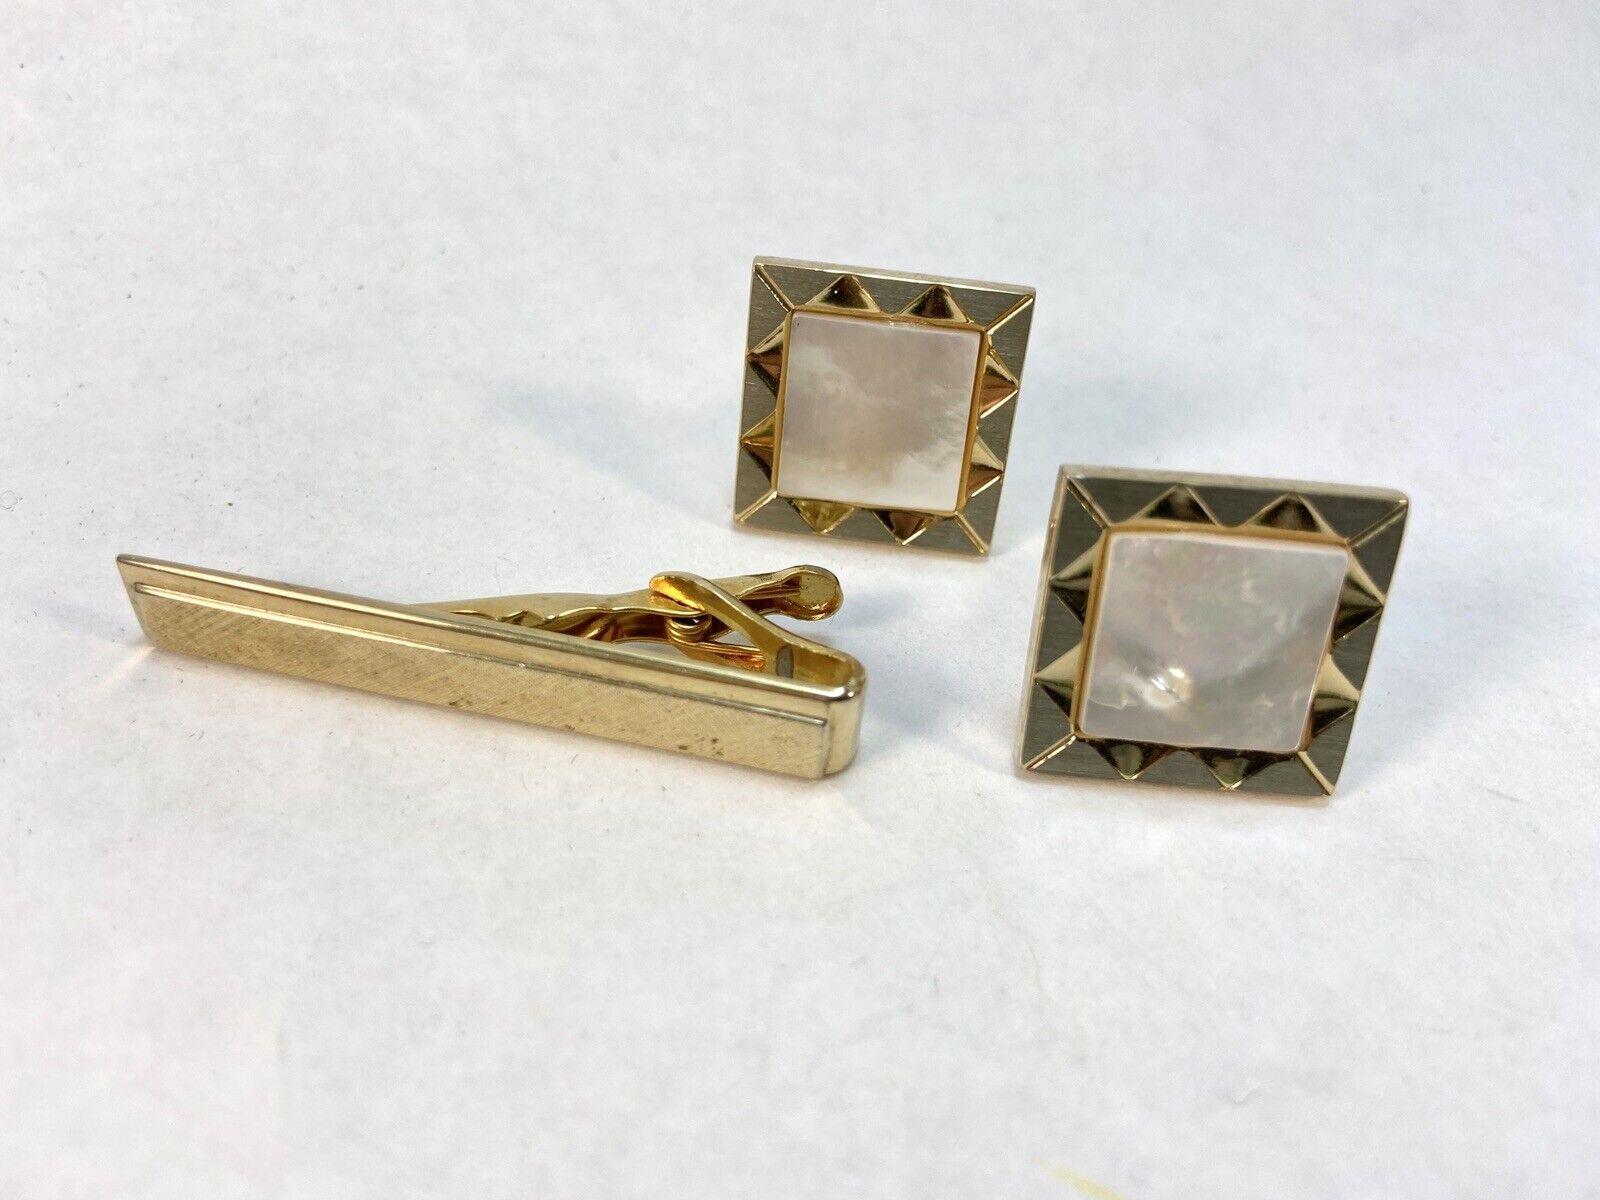 Vintage Square Gold Tone SWANK Cufflinks